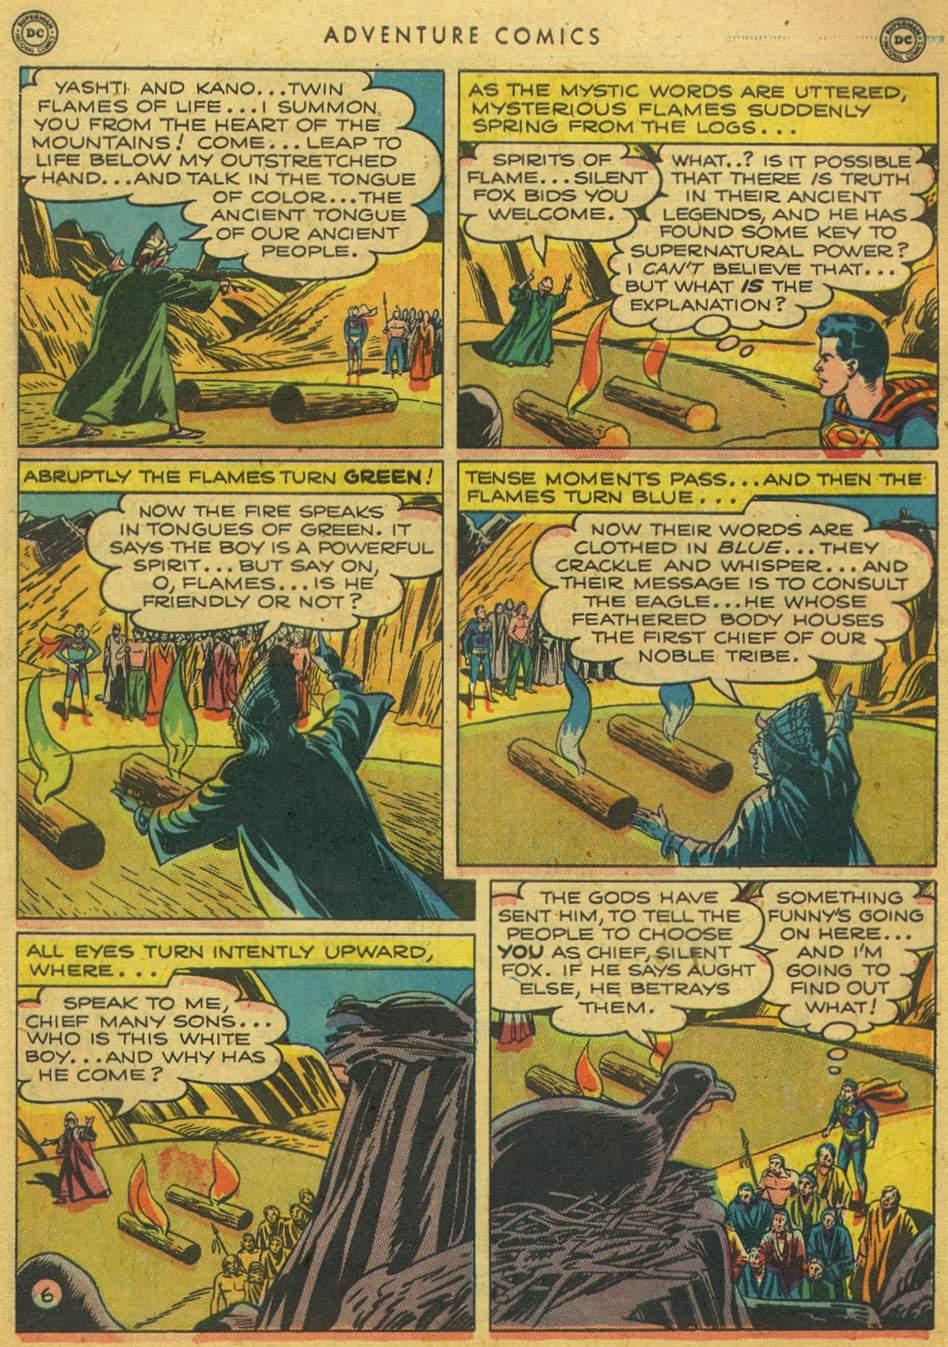 Read online Adventure Comics (1938) comic -  Issue #164 - 8